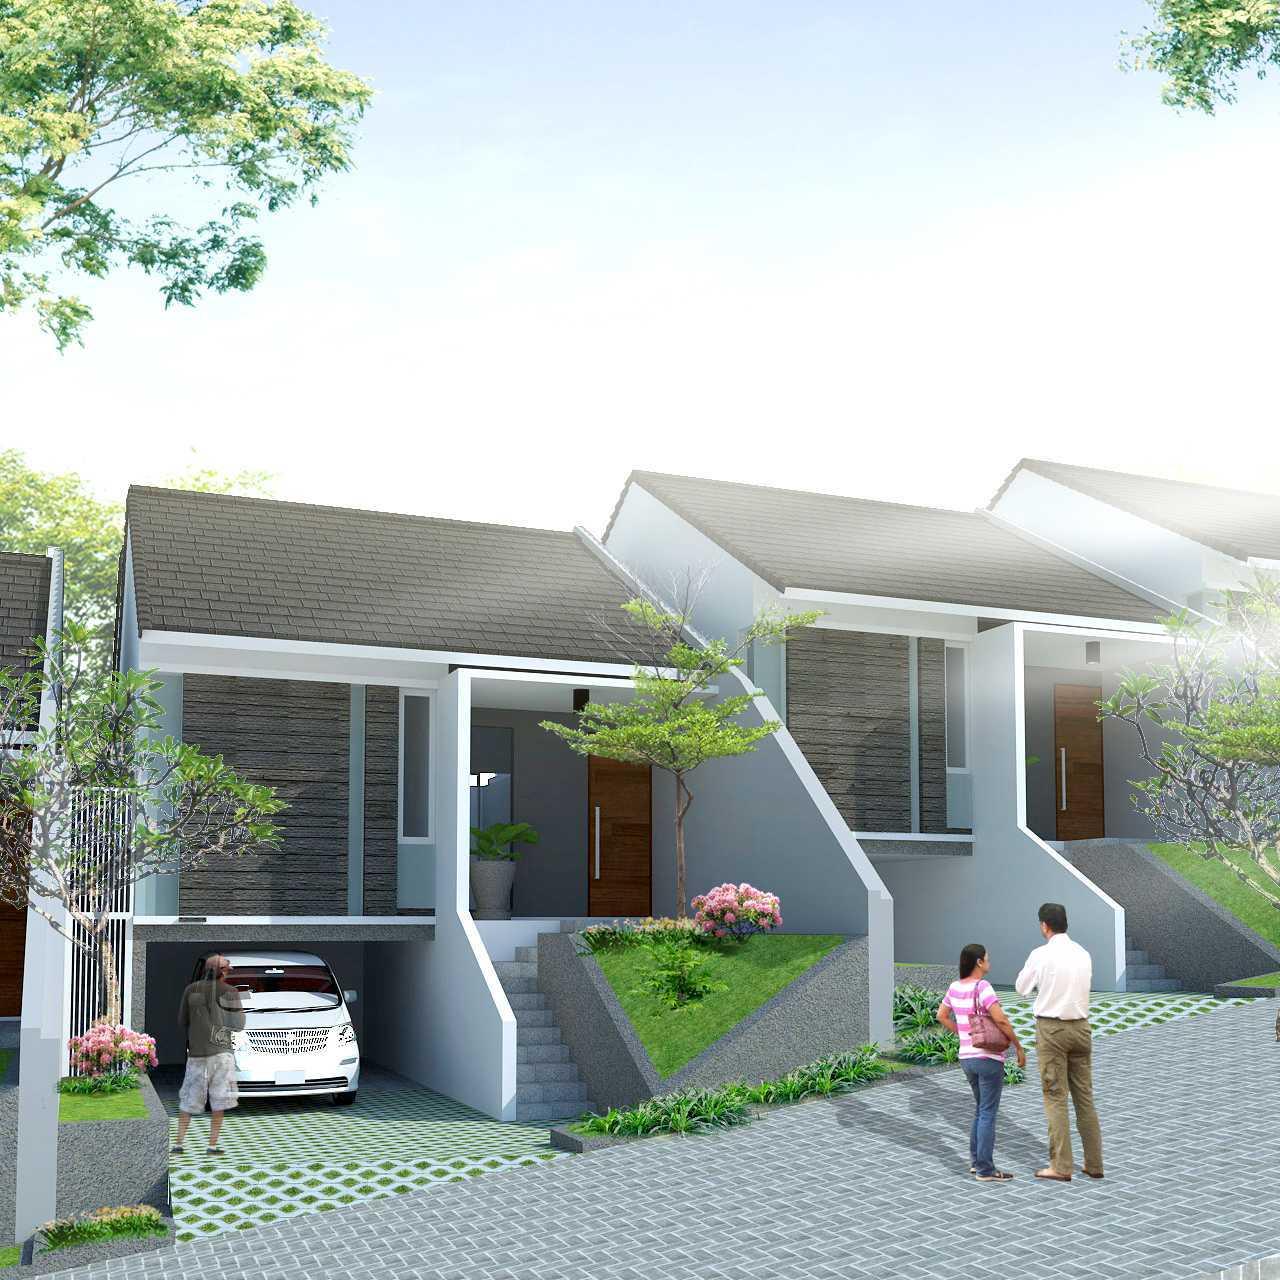 Ardharakhta Architect And Associates Bogorbaru Riverview Bogor, Jawa Barat, Indonesia Bogor, Jawa Barat, Indonesia Exterior View  <P>Type 120 A</p> 52086